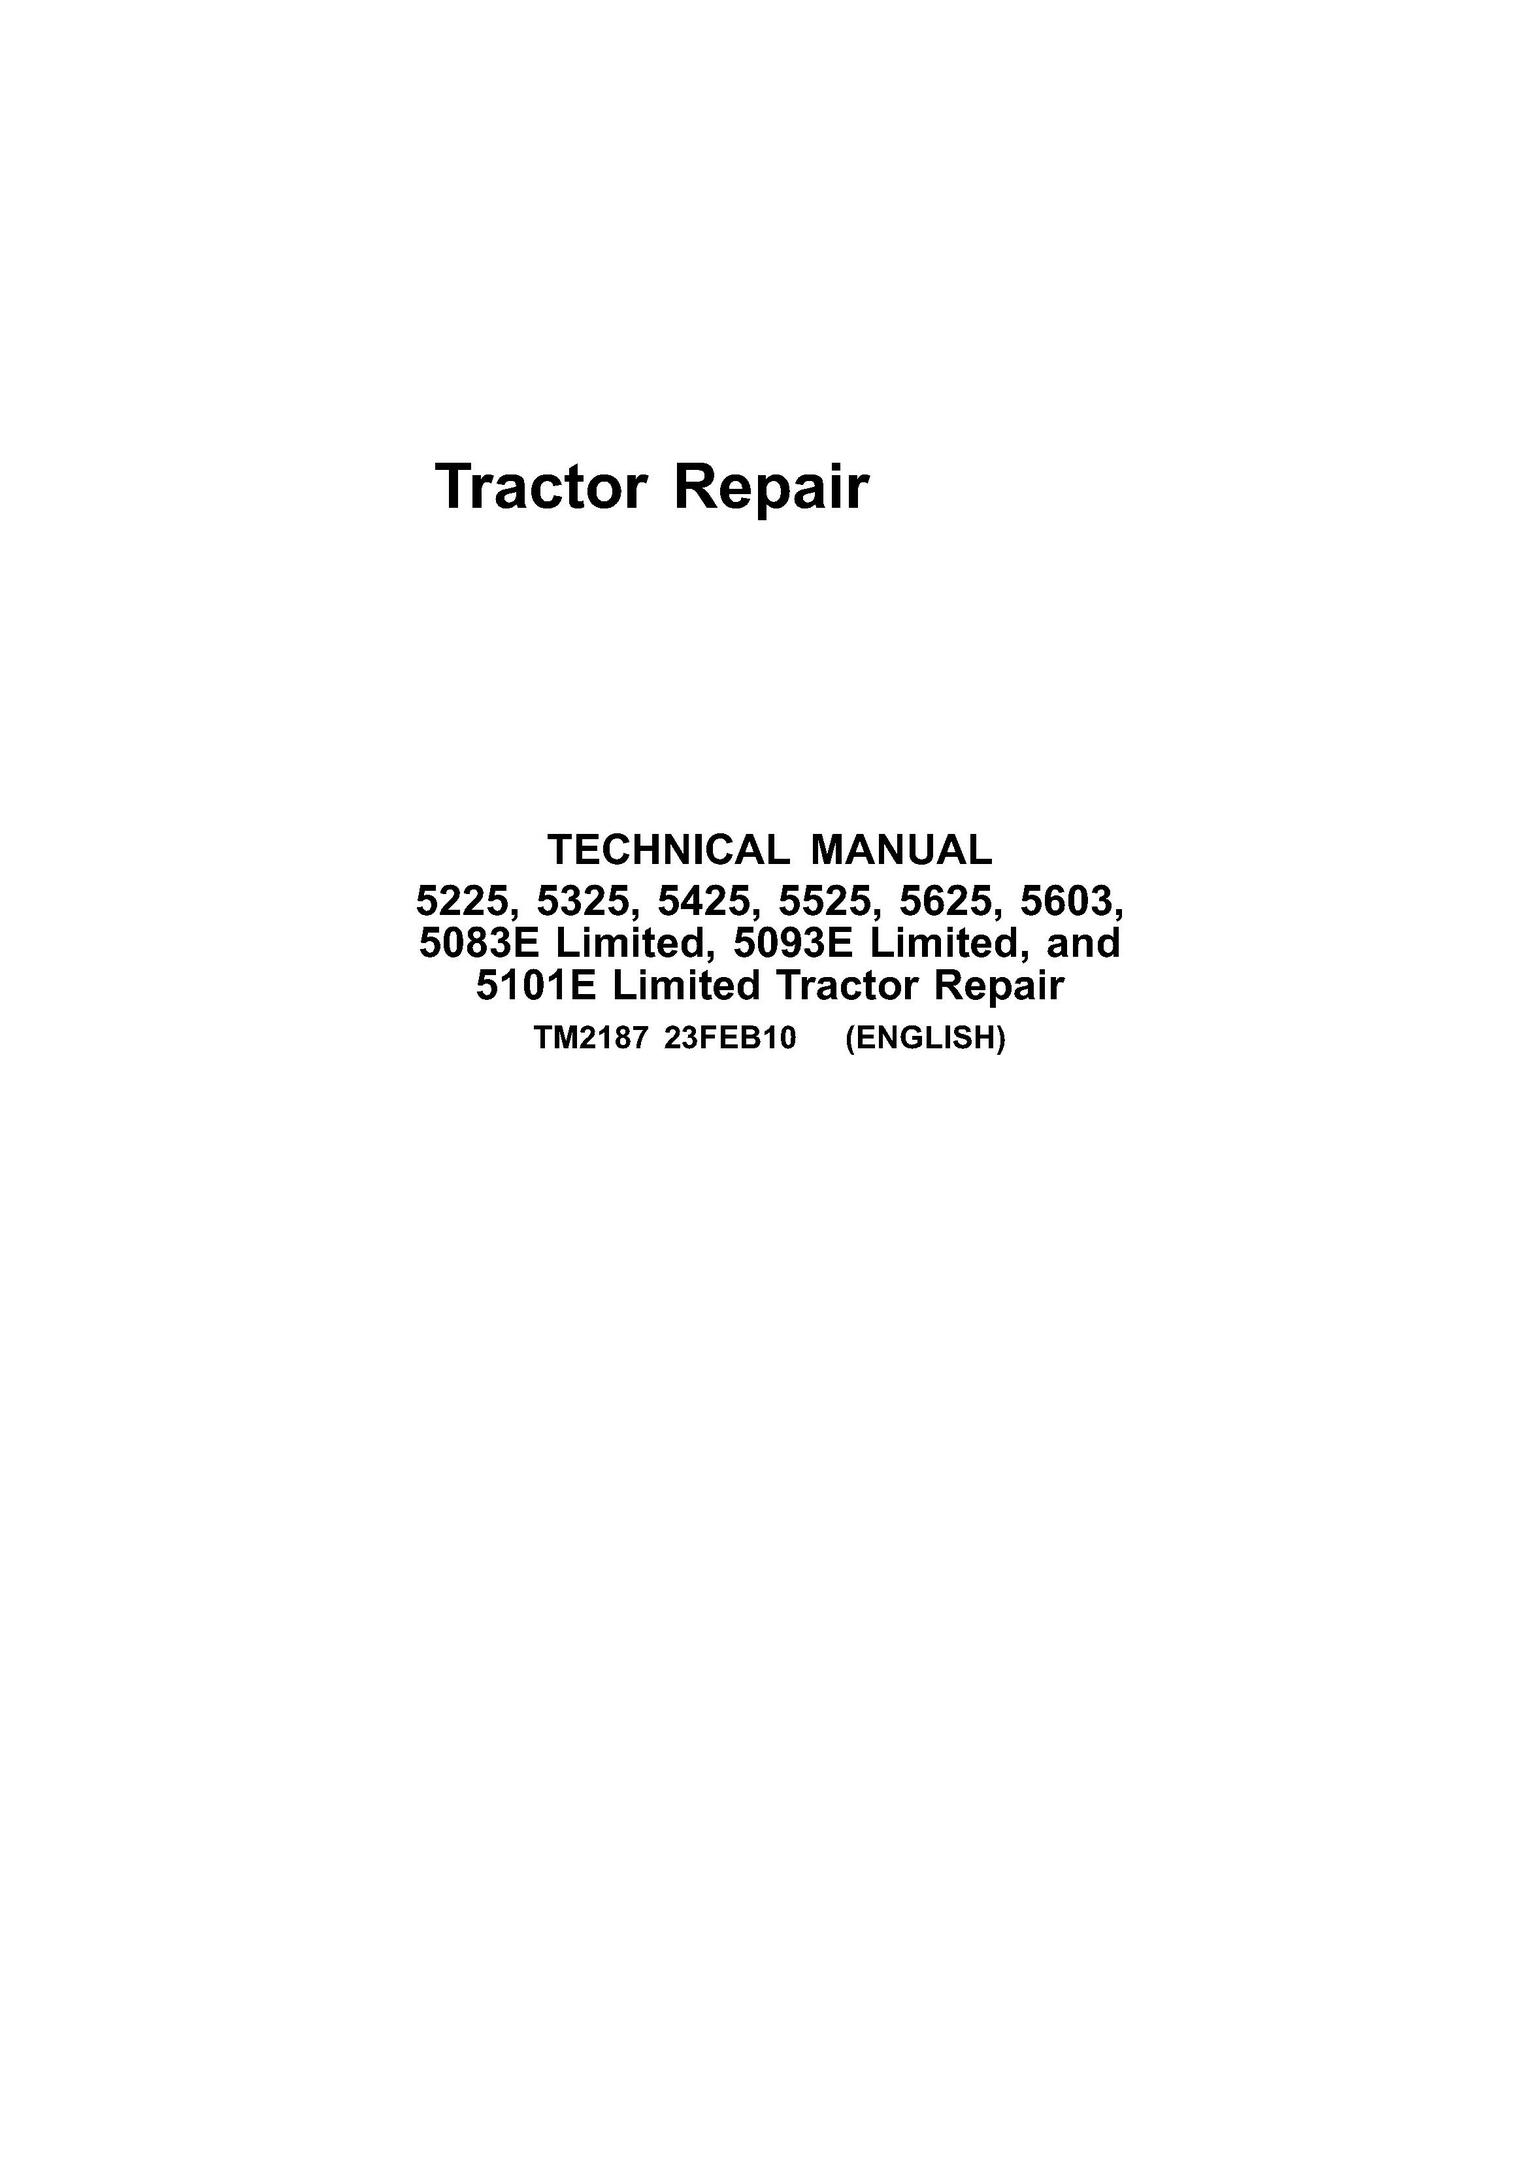 medium resolution of john deere 5425 wiring diagram john deere ignition switch diagram 5425 john deere light switch wiring diagram